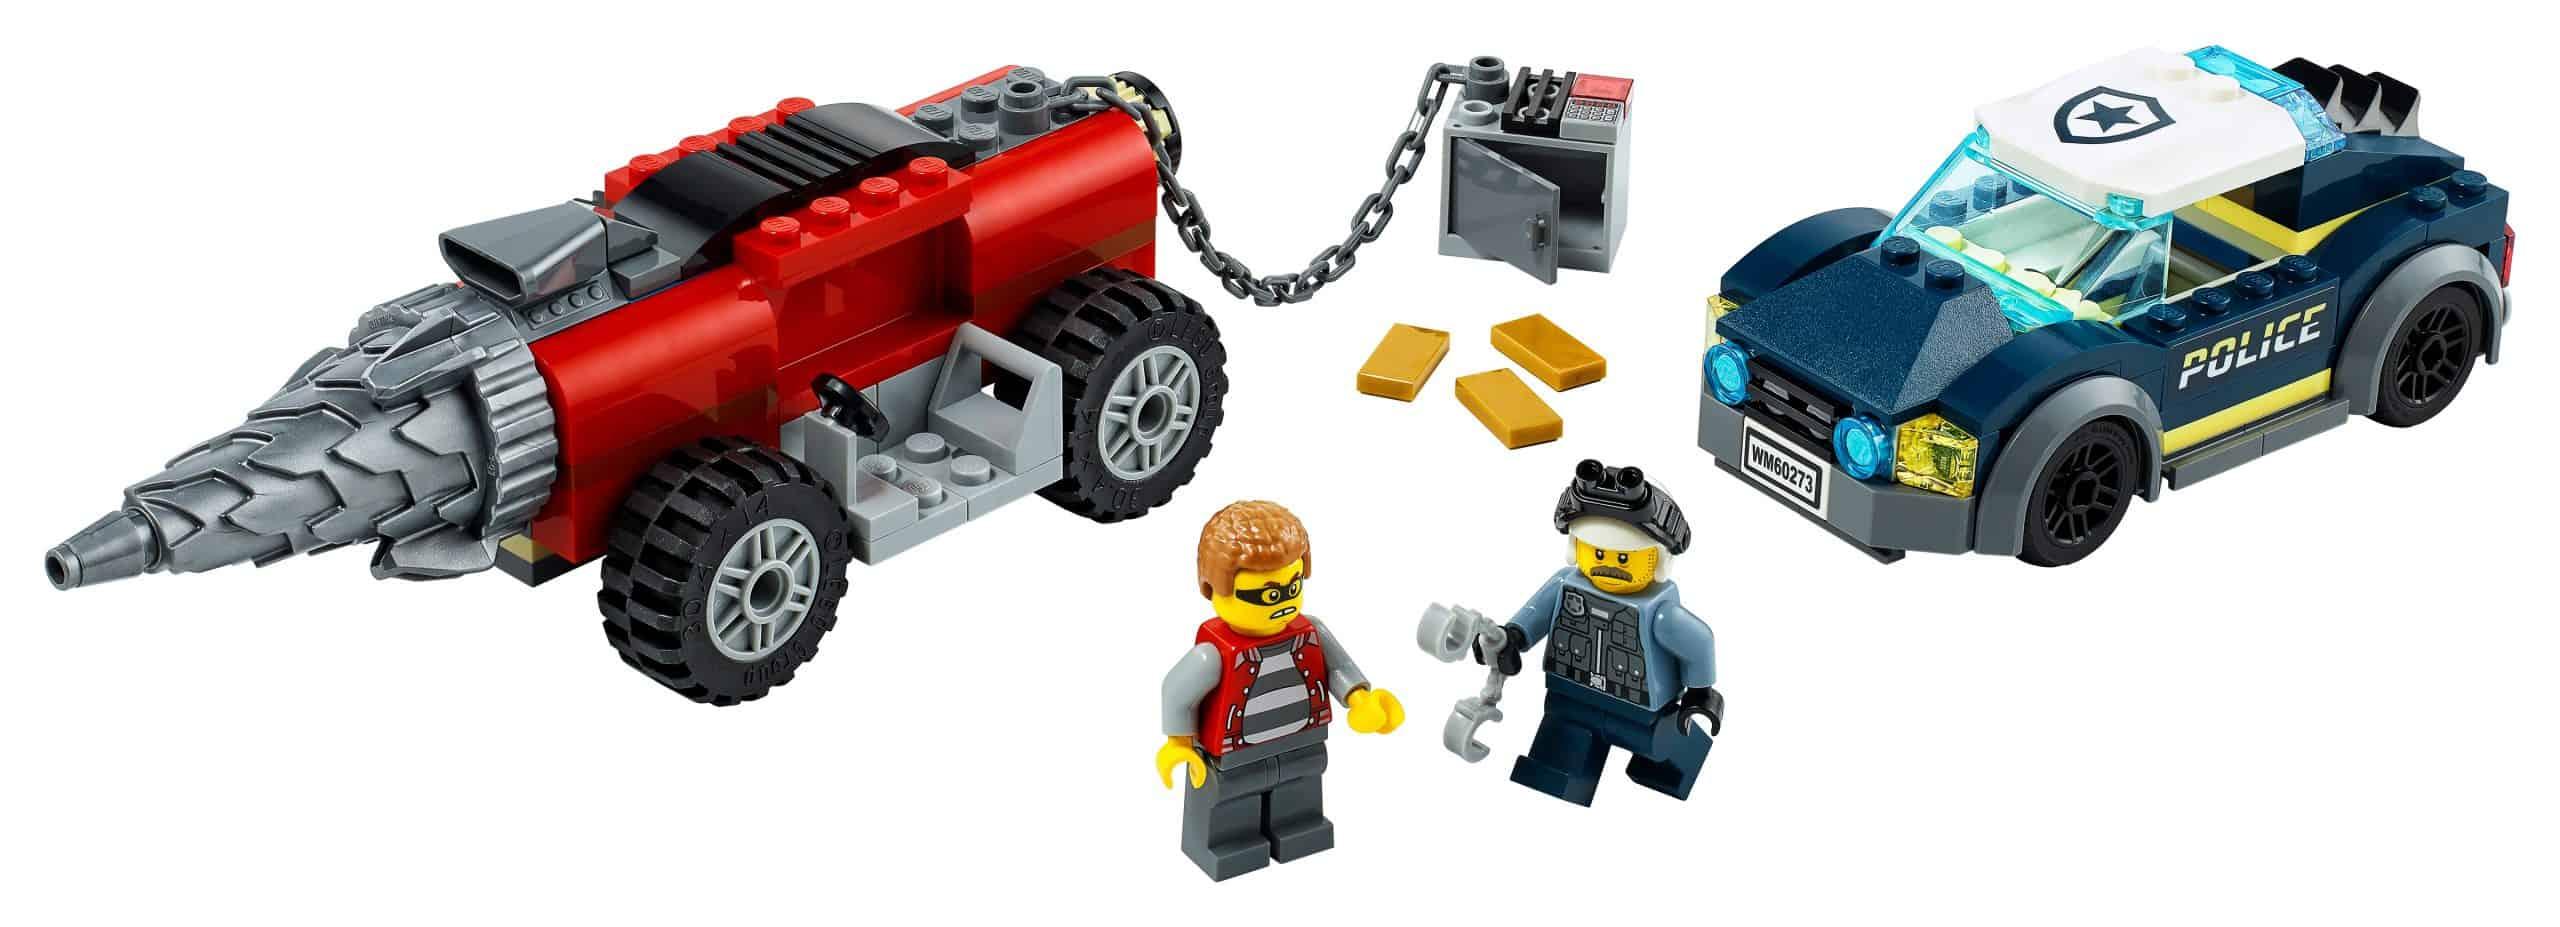 lego elite politie achtervolging boorder 60273 scaled